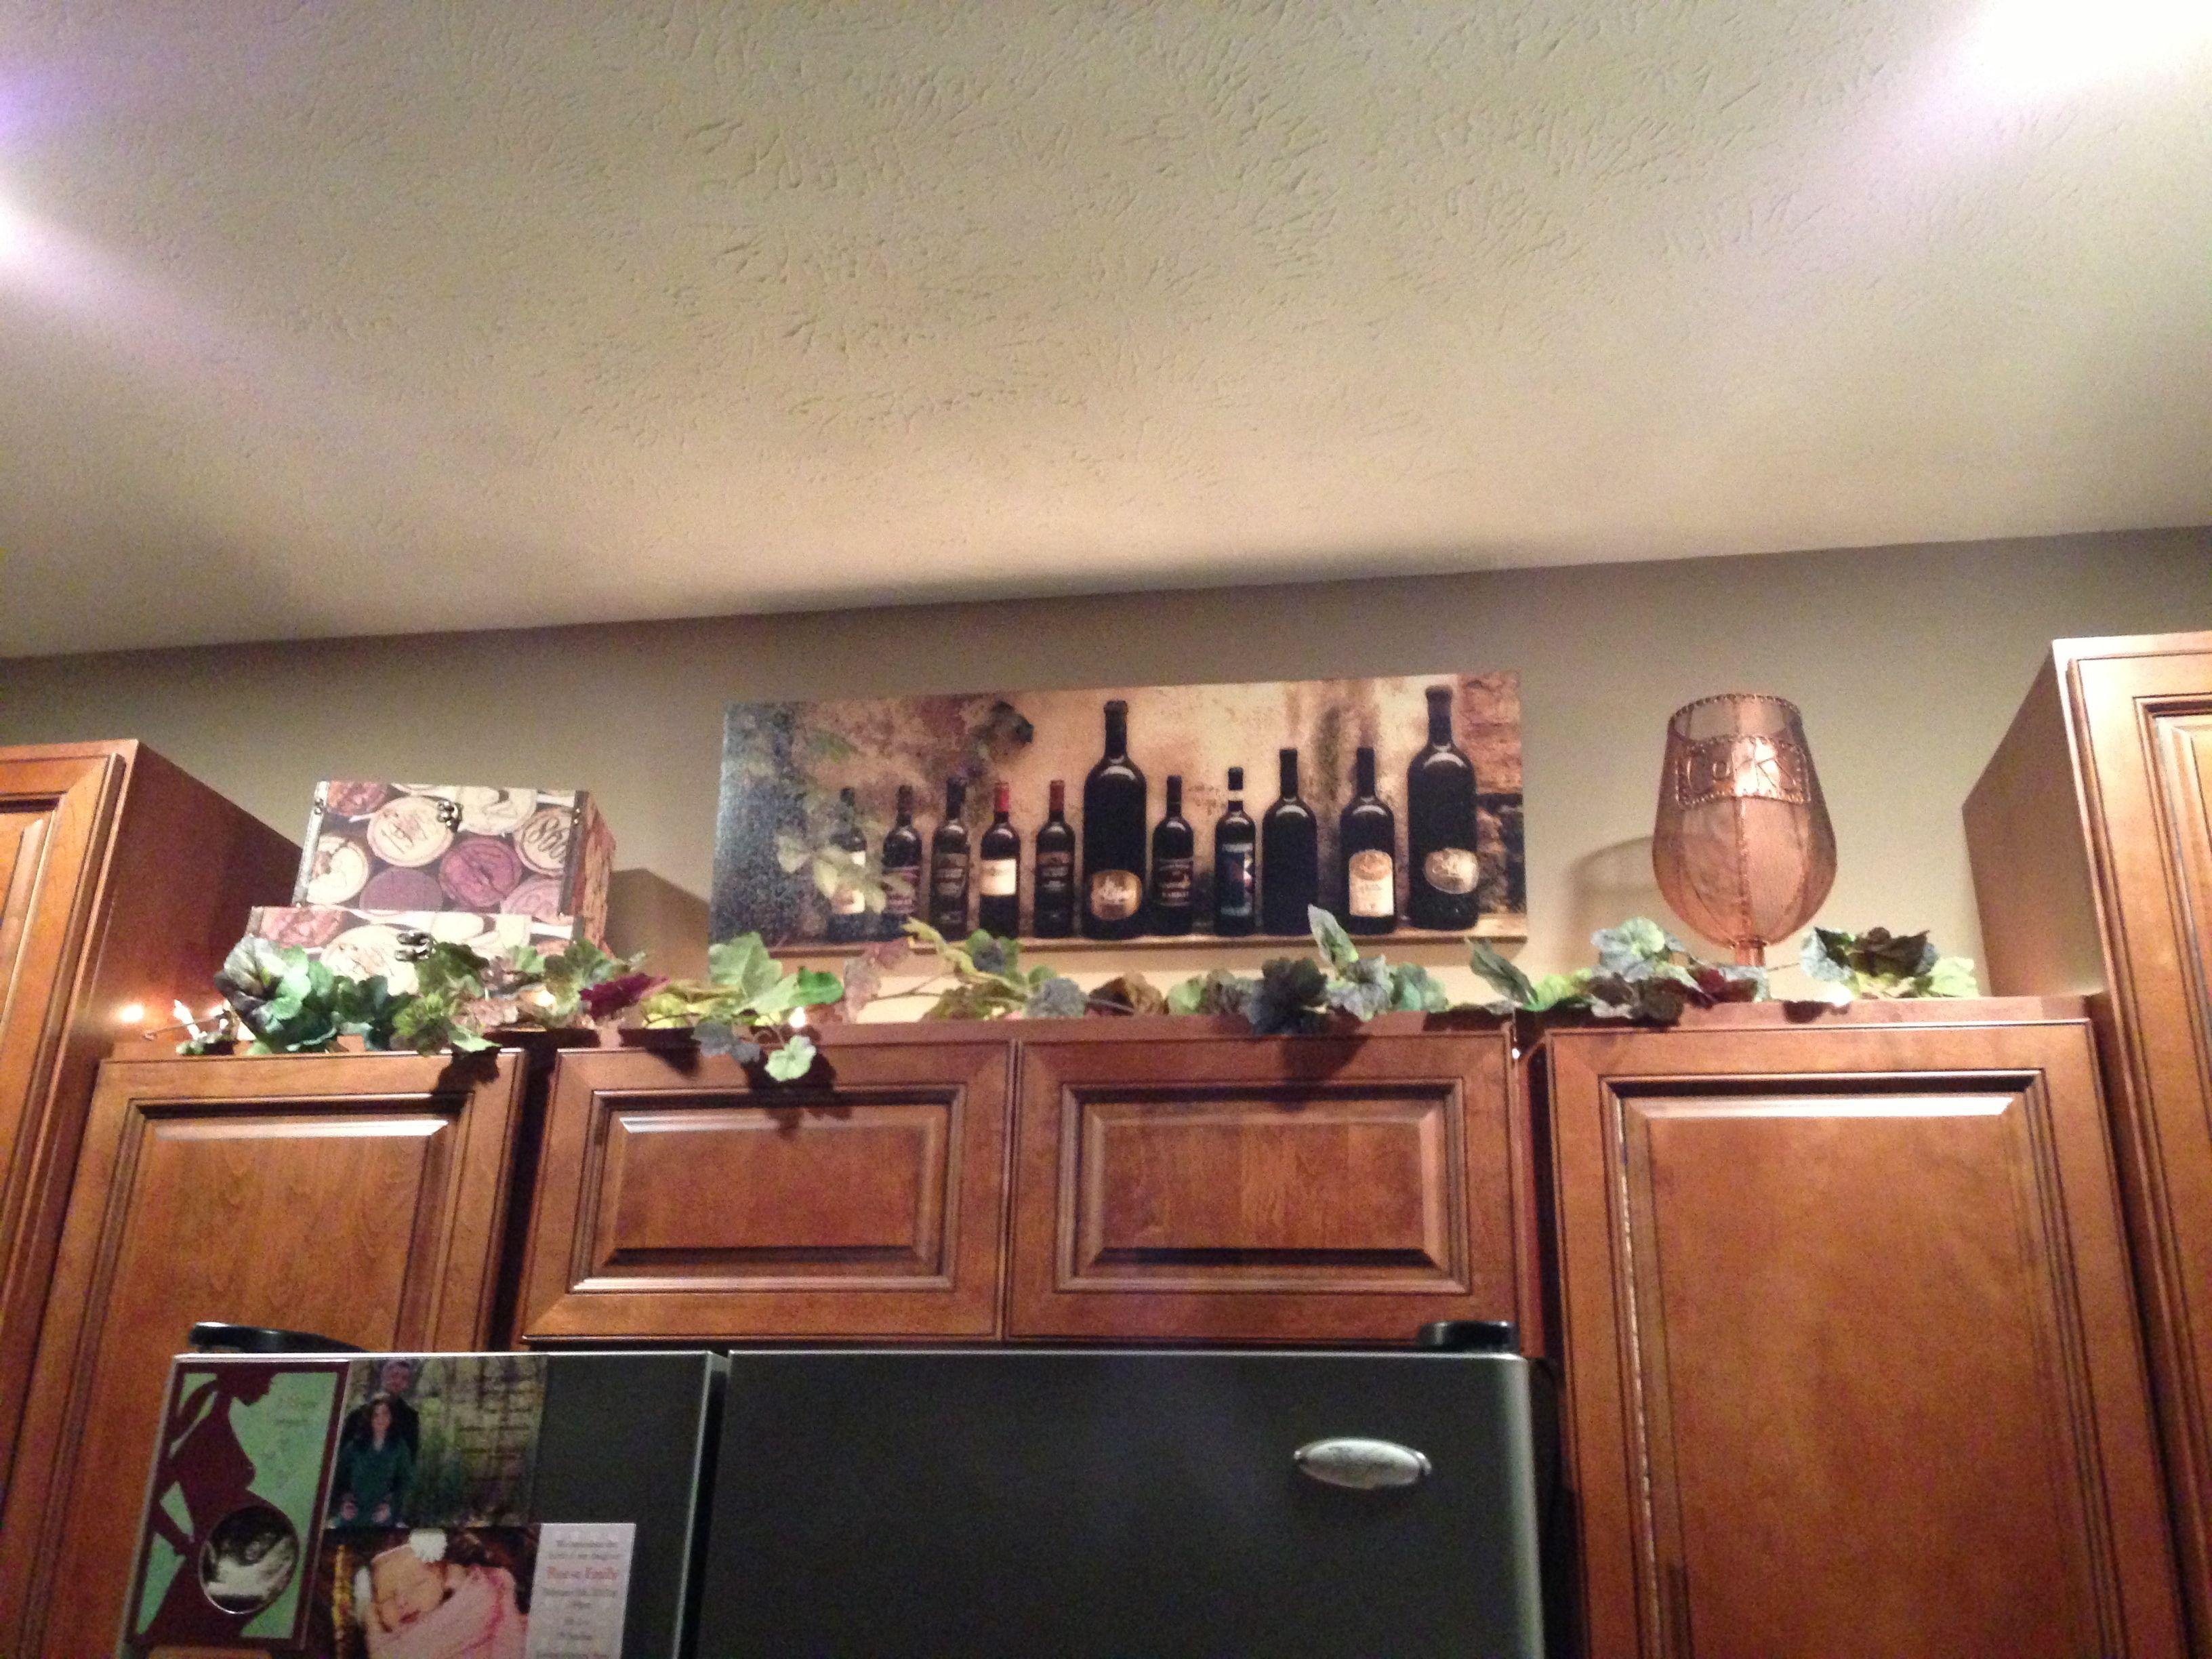 Wine kitchen cabinet decorations